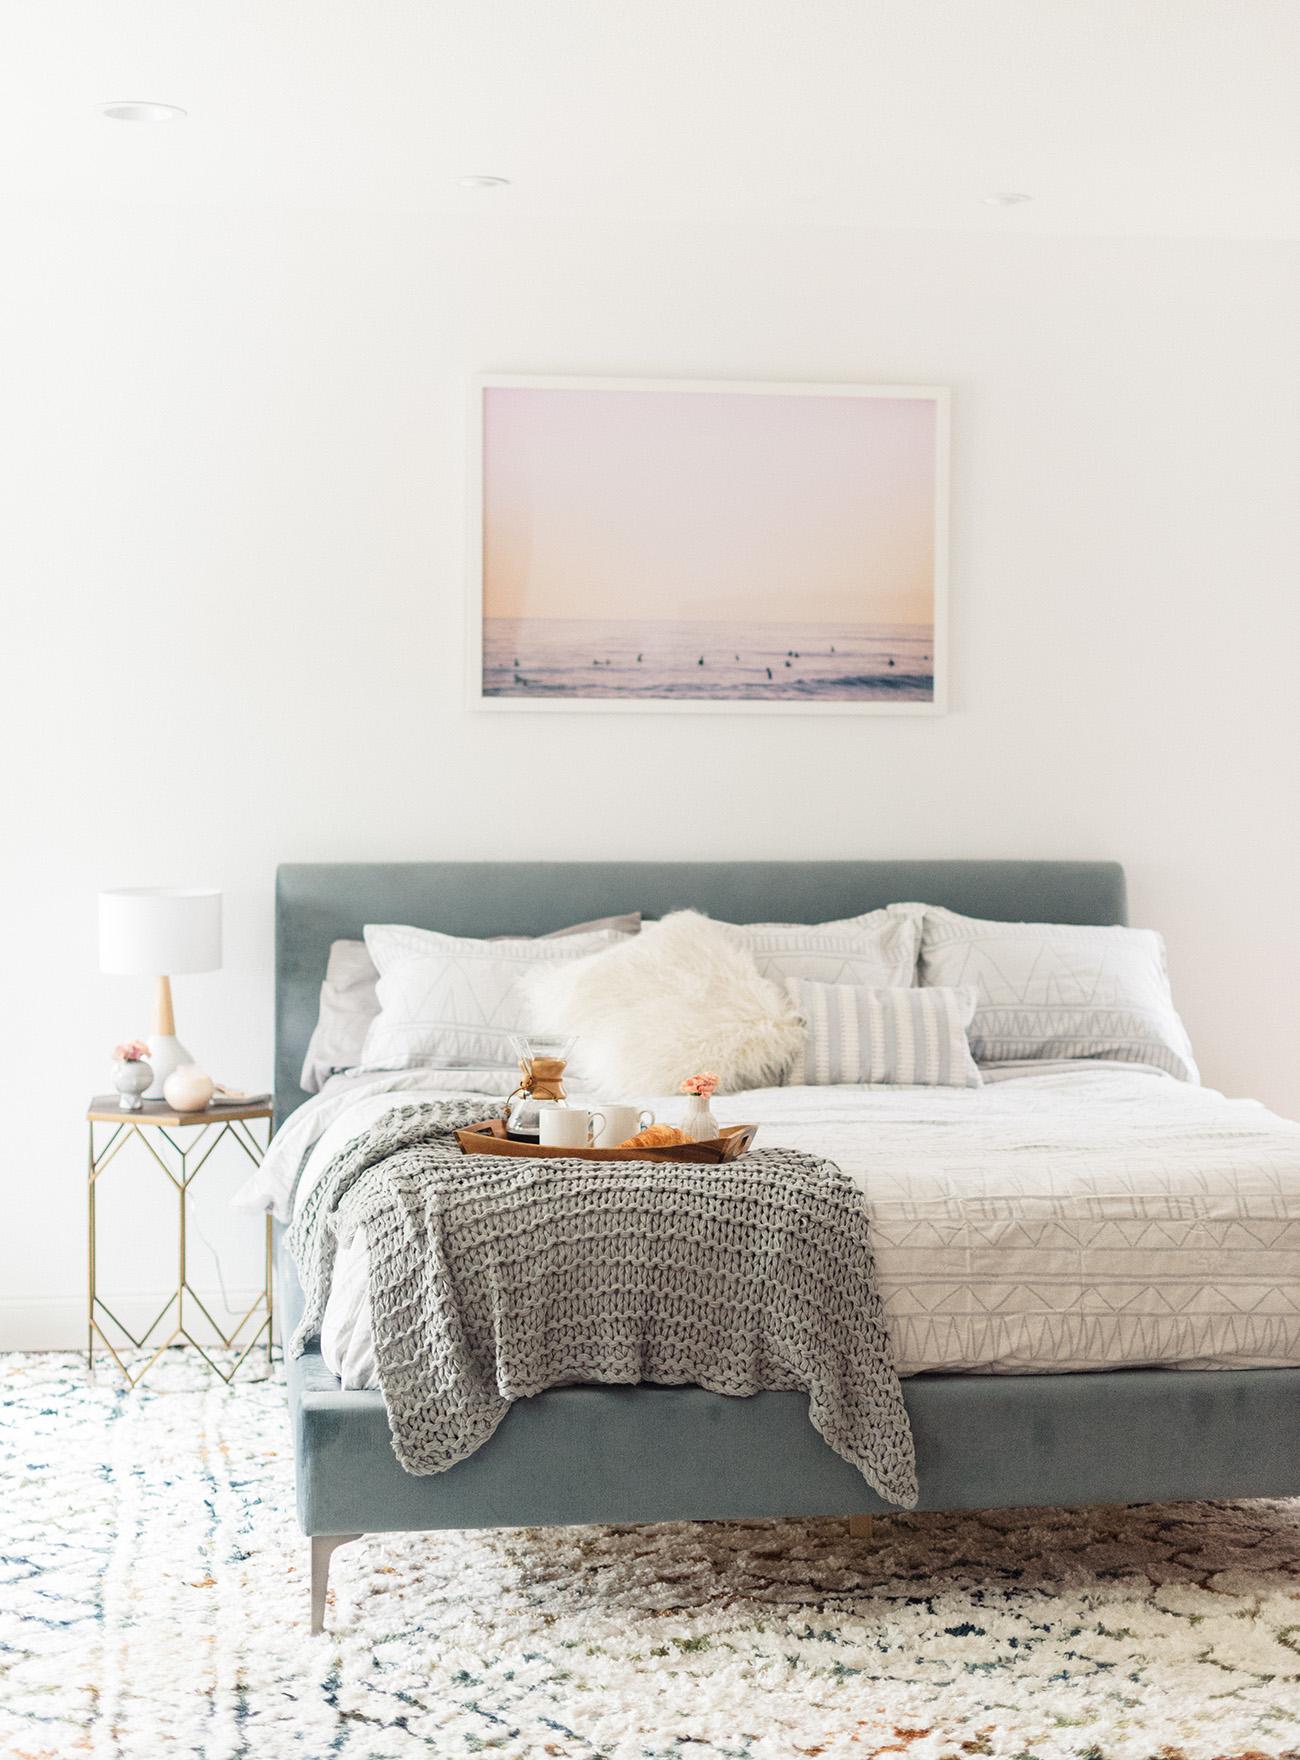 Minimalist Bedroom No Bed Novocom Top